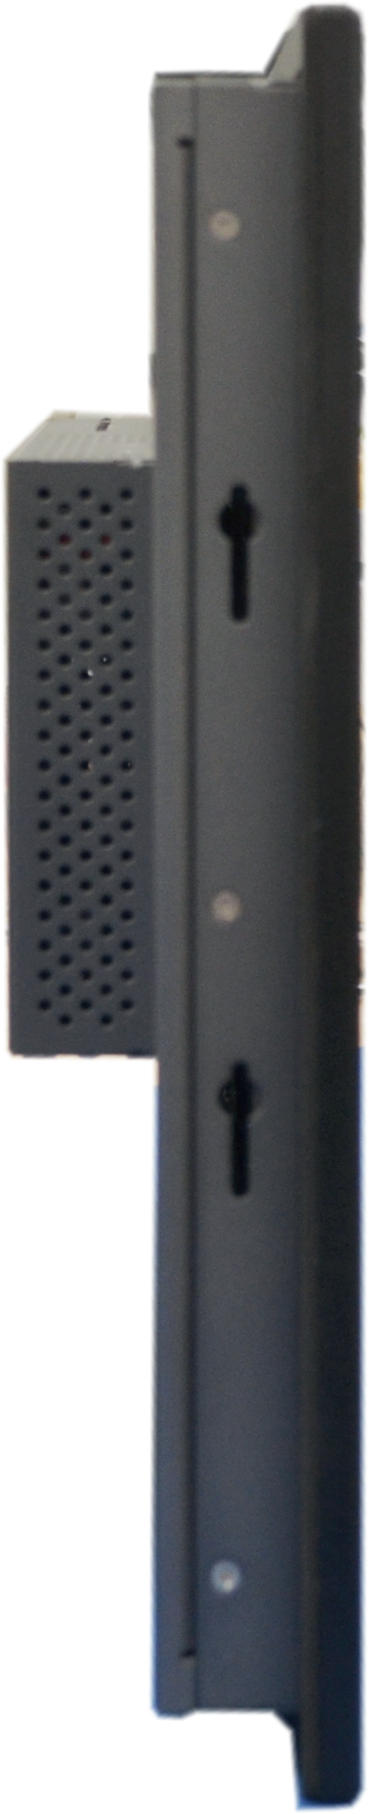 SW Monitors